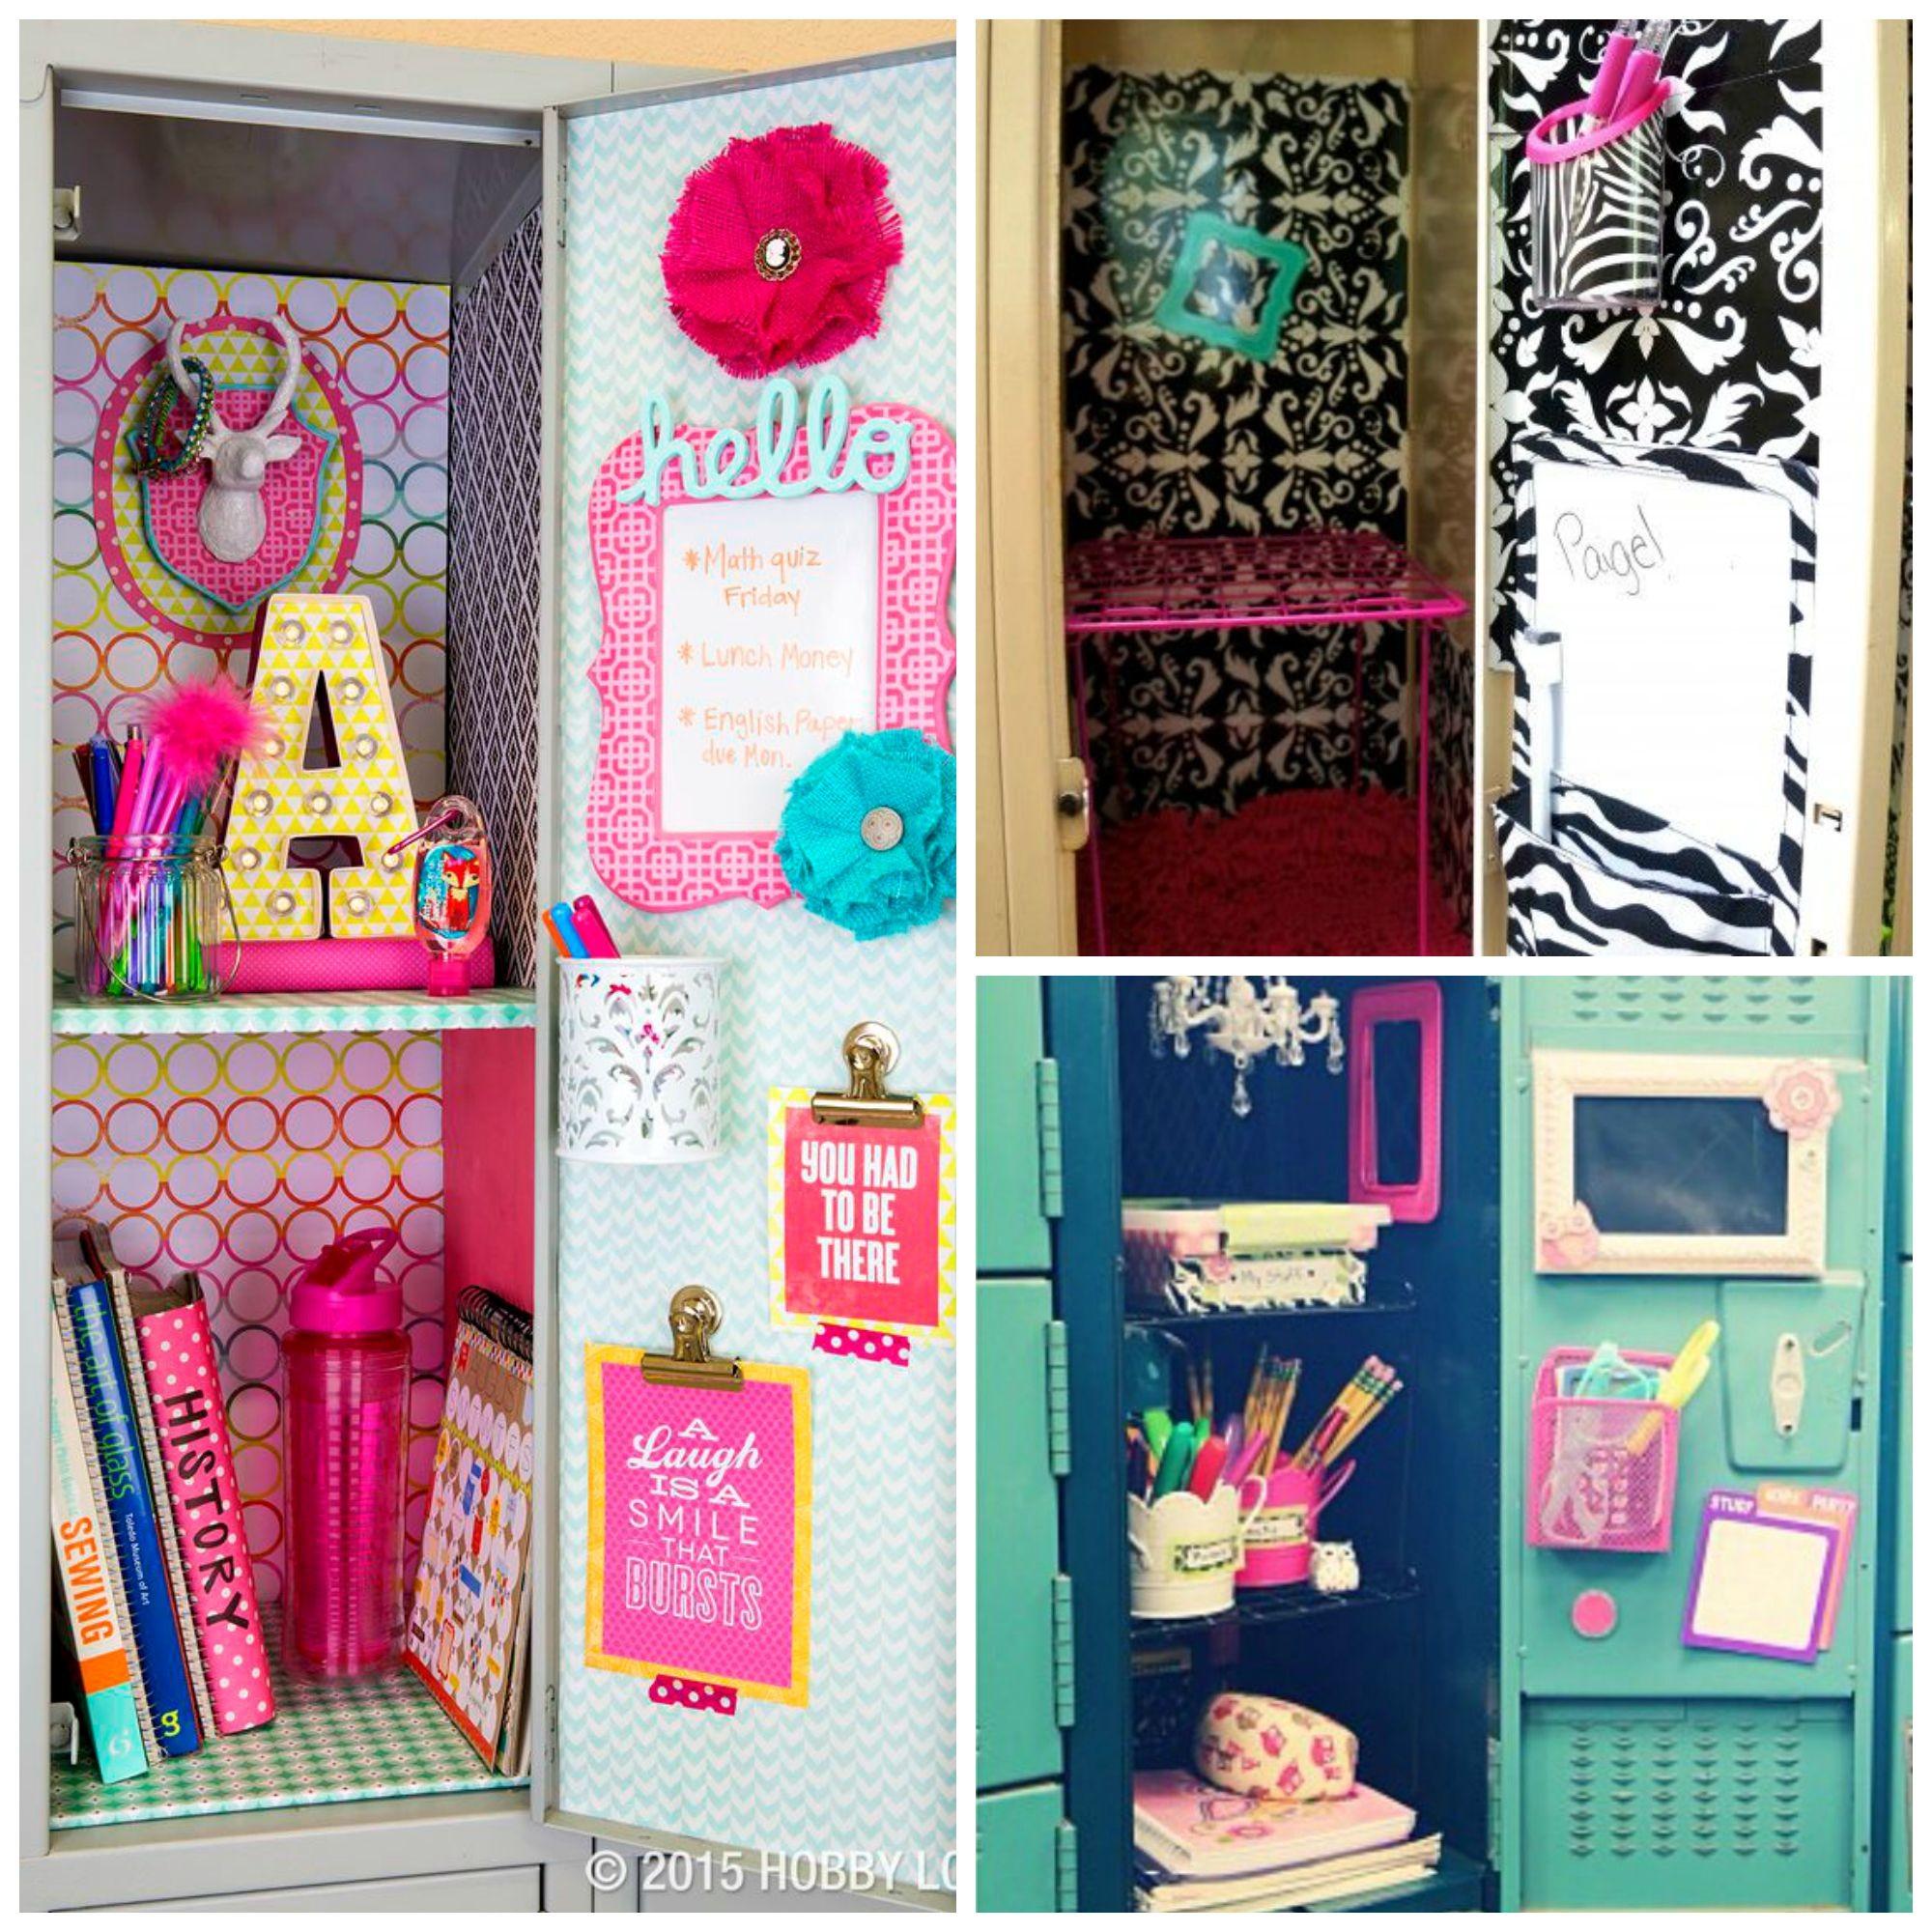 Locker Wallpaper Diy: Magnetic Locker Wallpaper For Boys (36+ Images